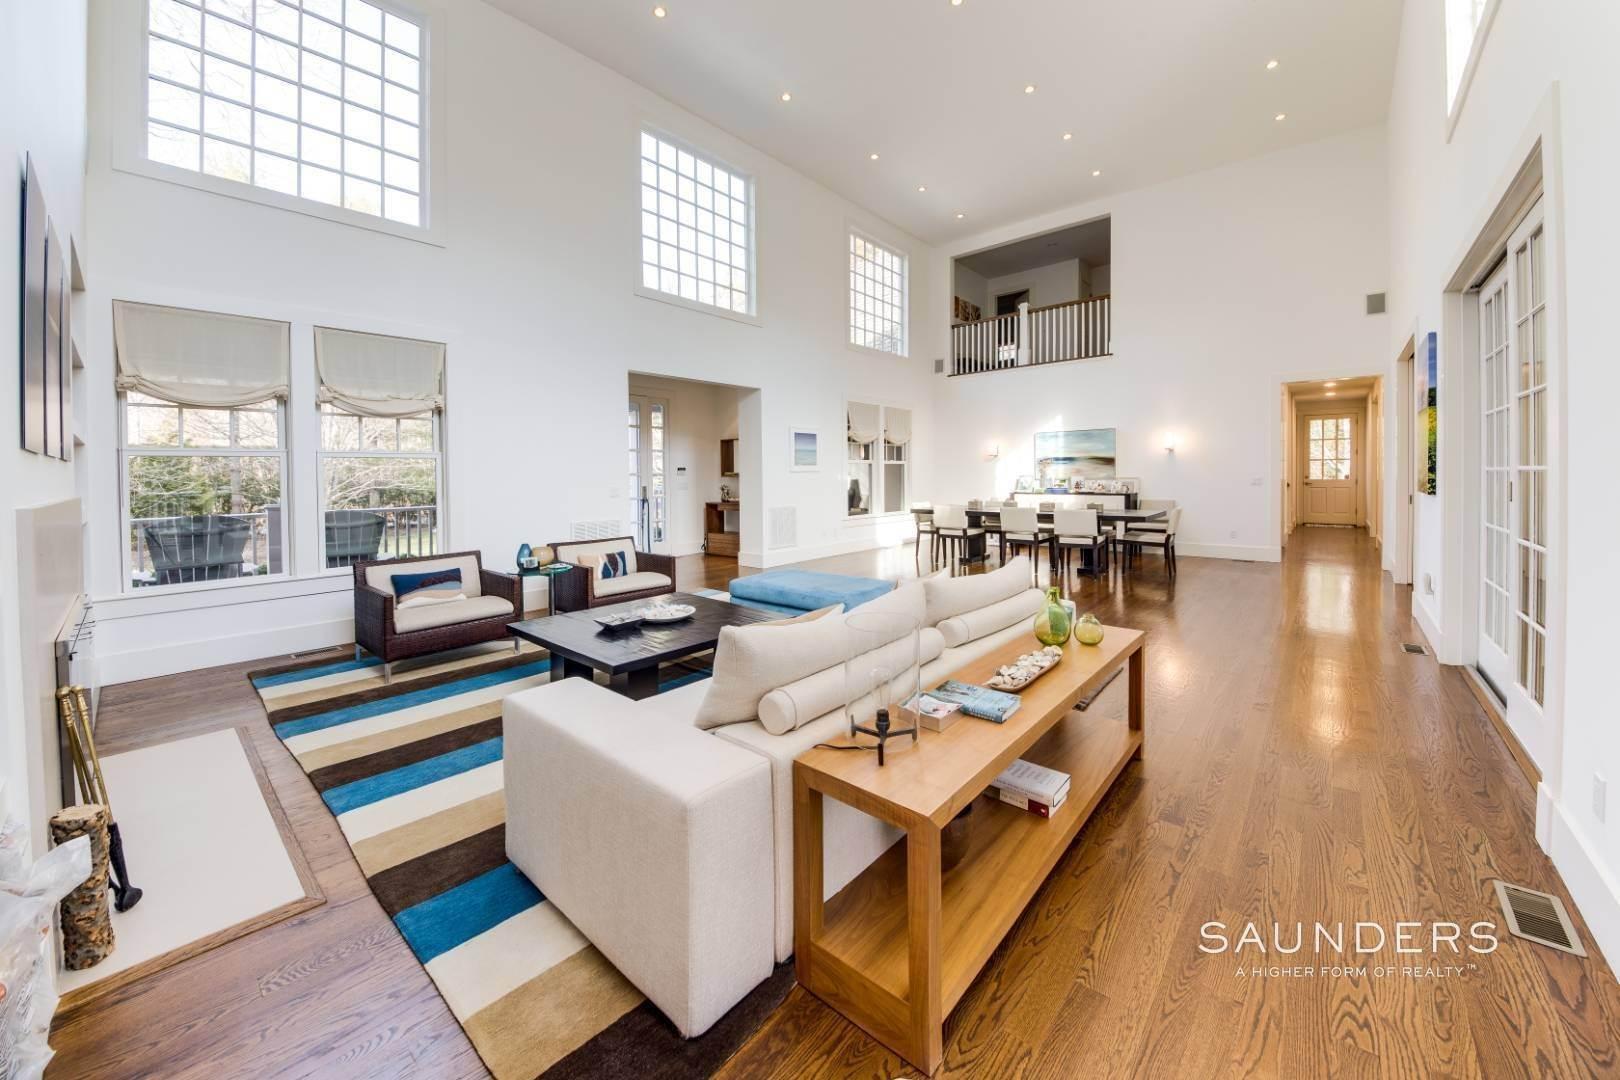 6. Single Family Homes for Sale at Wainscott South Traditional Near Beach Lane 10 Merriwood Drive, Wainscott, East Hampton Town, NY 11975